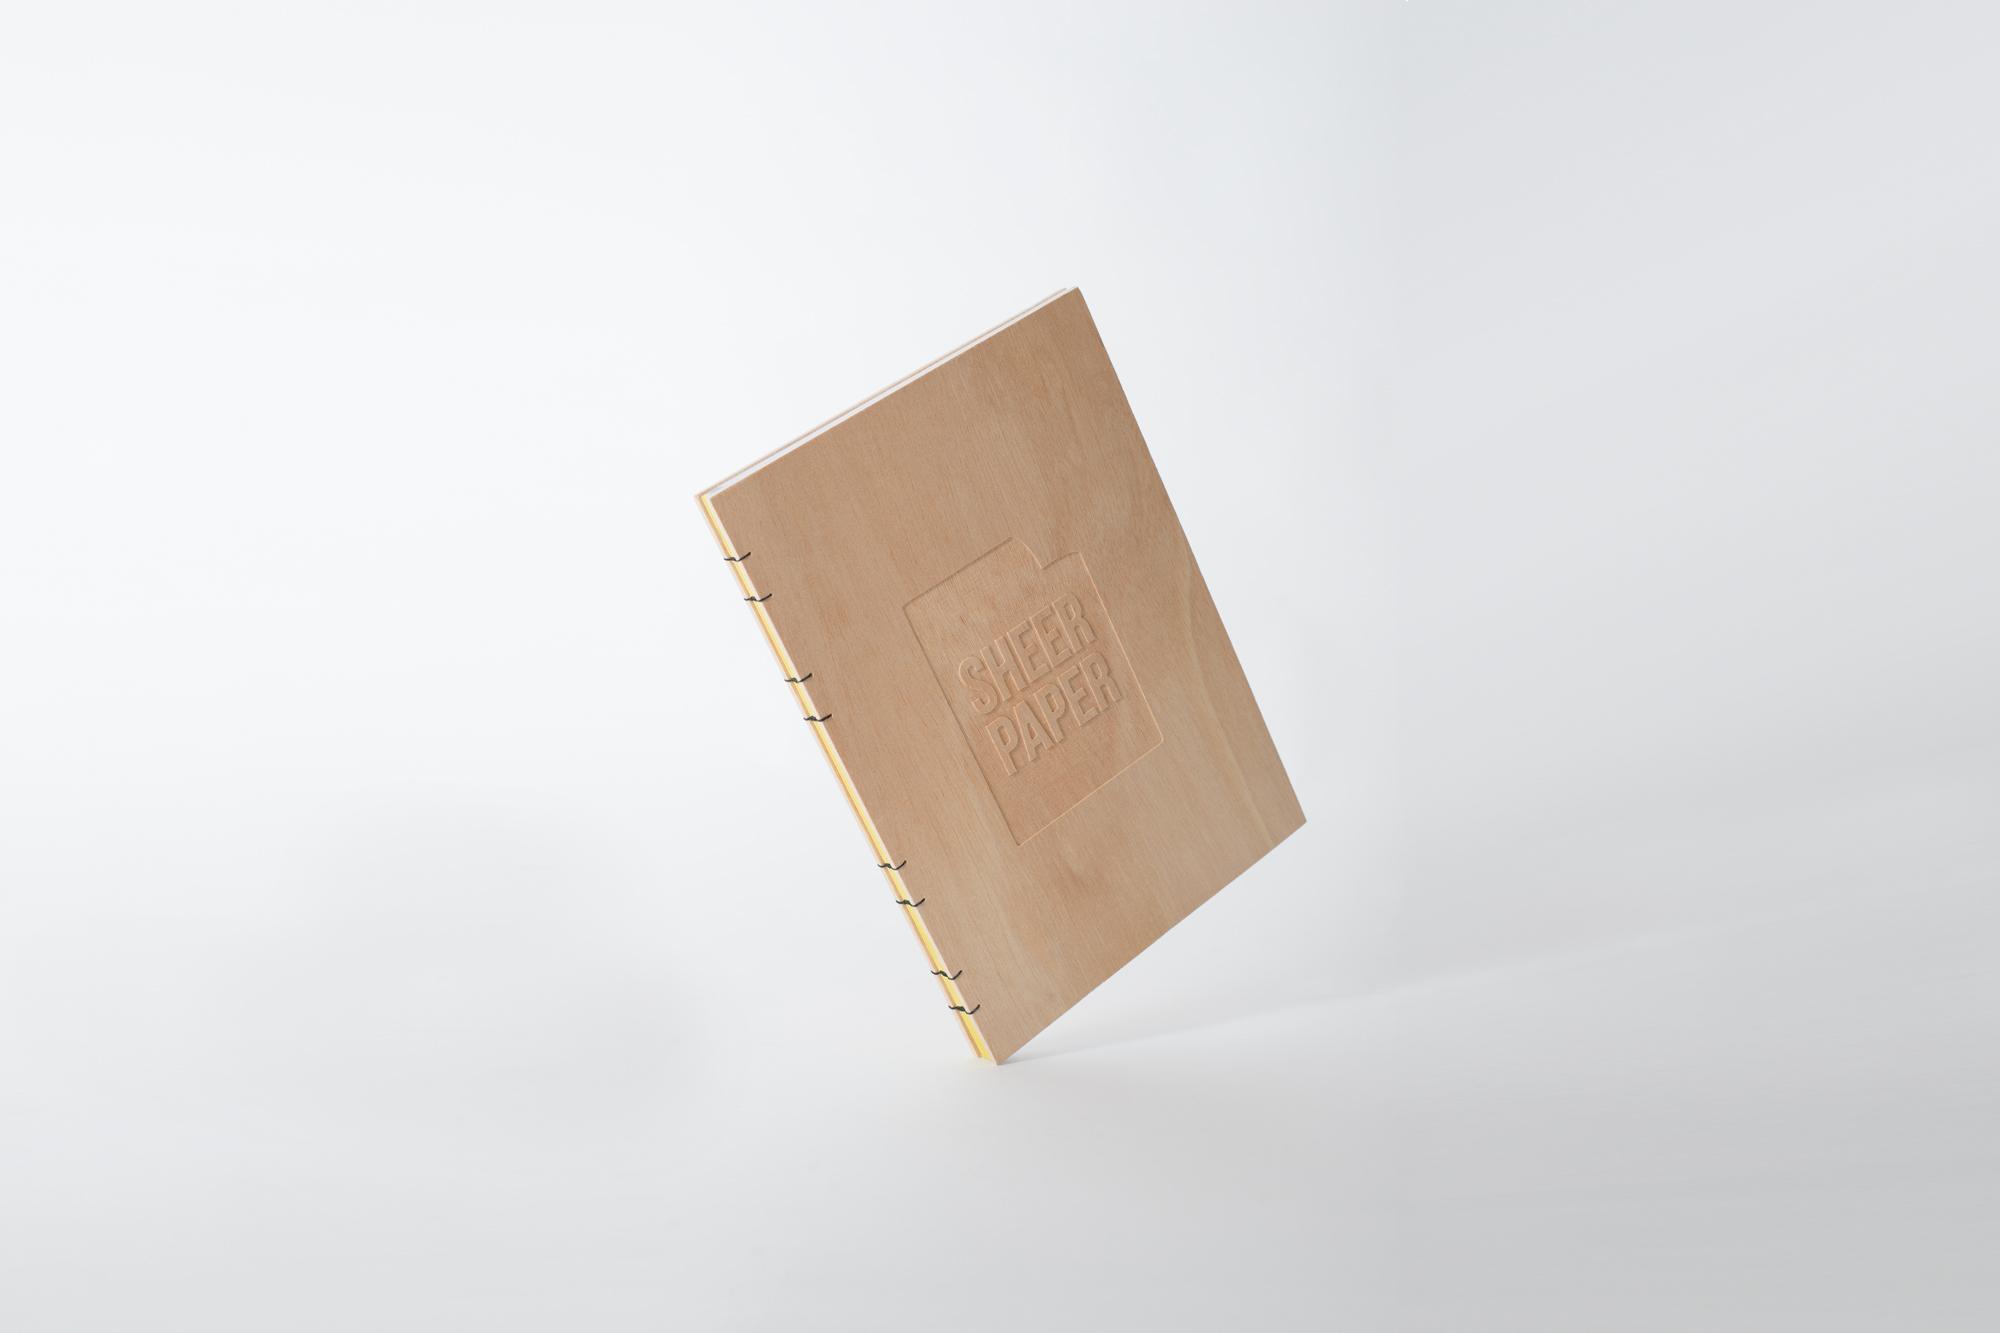 Holzbuch schwebend